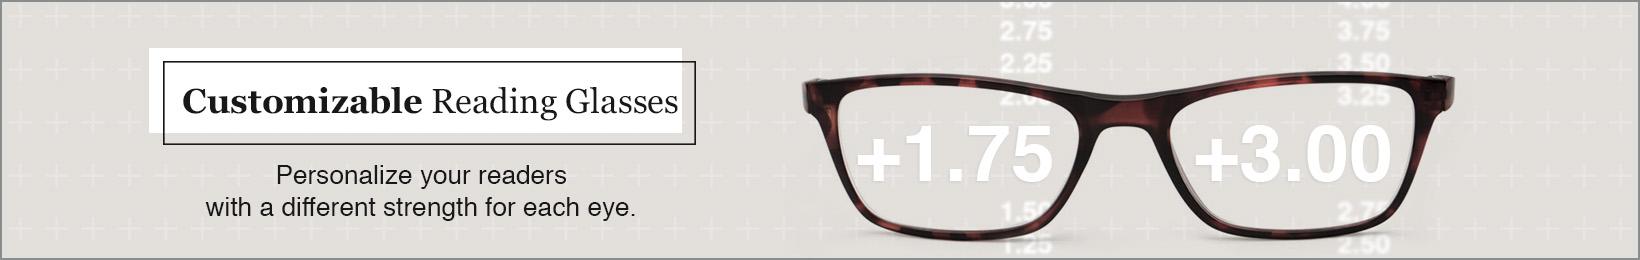 Customizable Reading Glasses